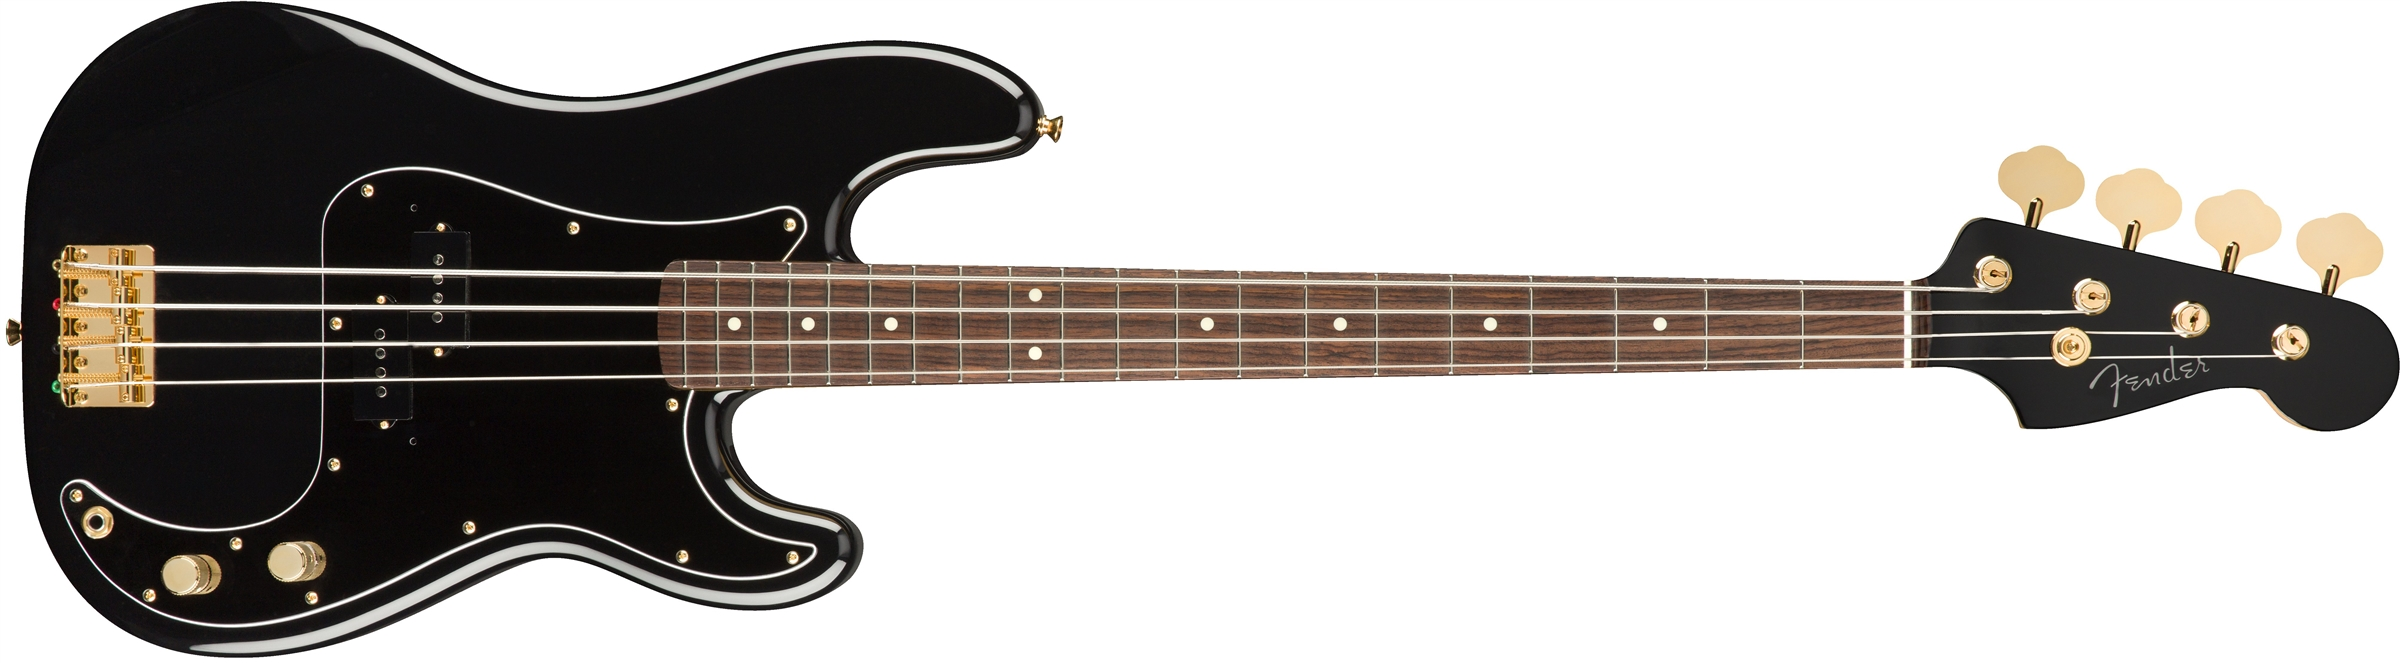 Autenticidade de Fender - Página 2 5564600306_gtr_frt_001_rr